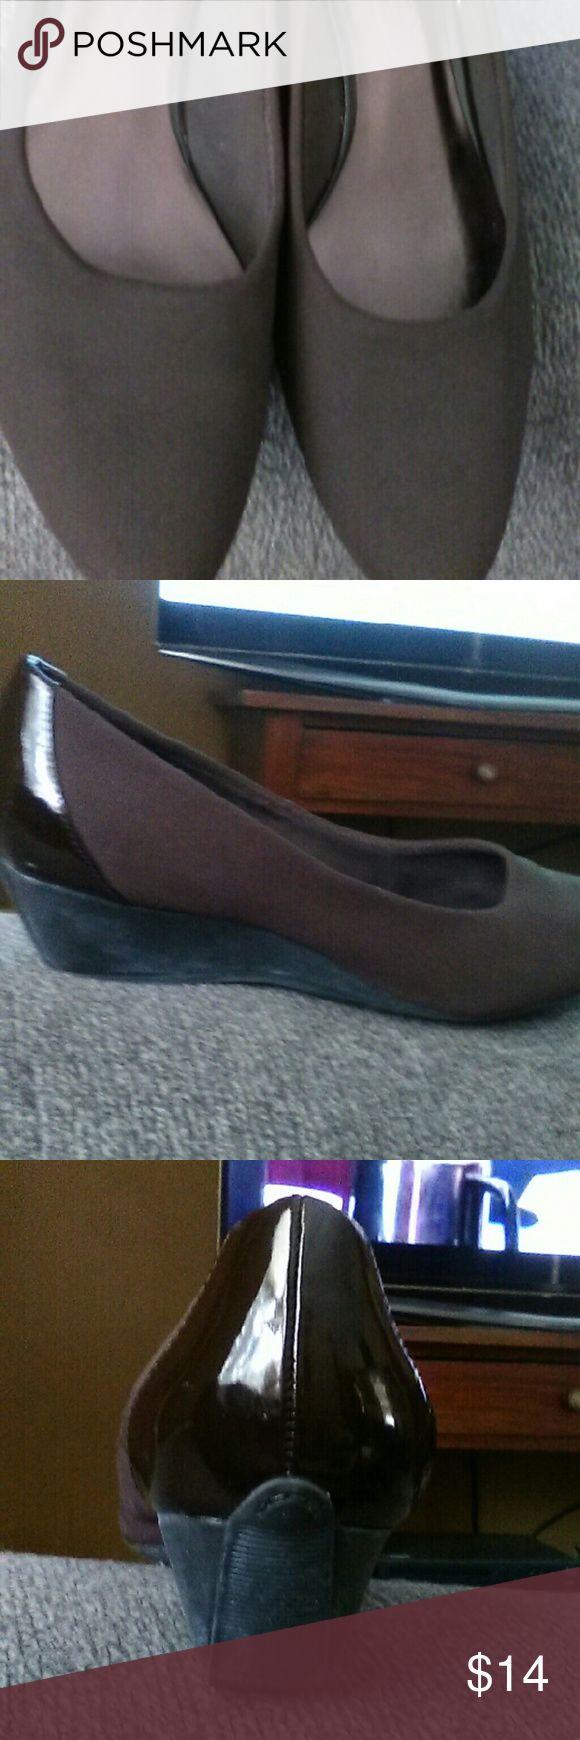 "Circa Joan & David Brown sz 7 1/2 Wedge Shoes Nice comfortable wedge shoes.  Sz 7 1/2.  Wedge heel of 1 1/2"" Joan & David Shoes Wedges"